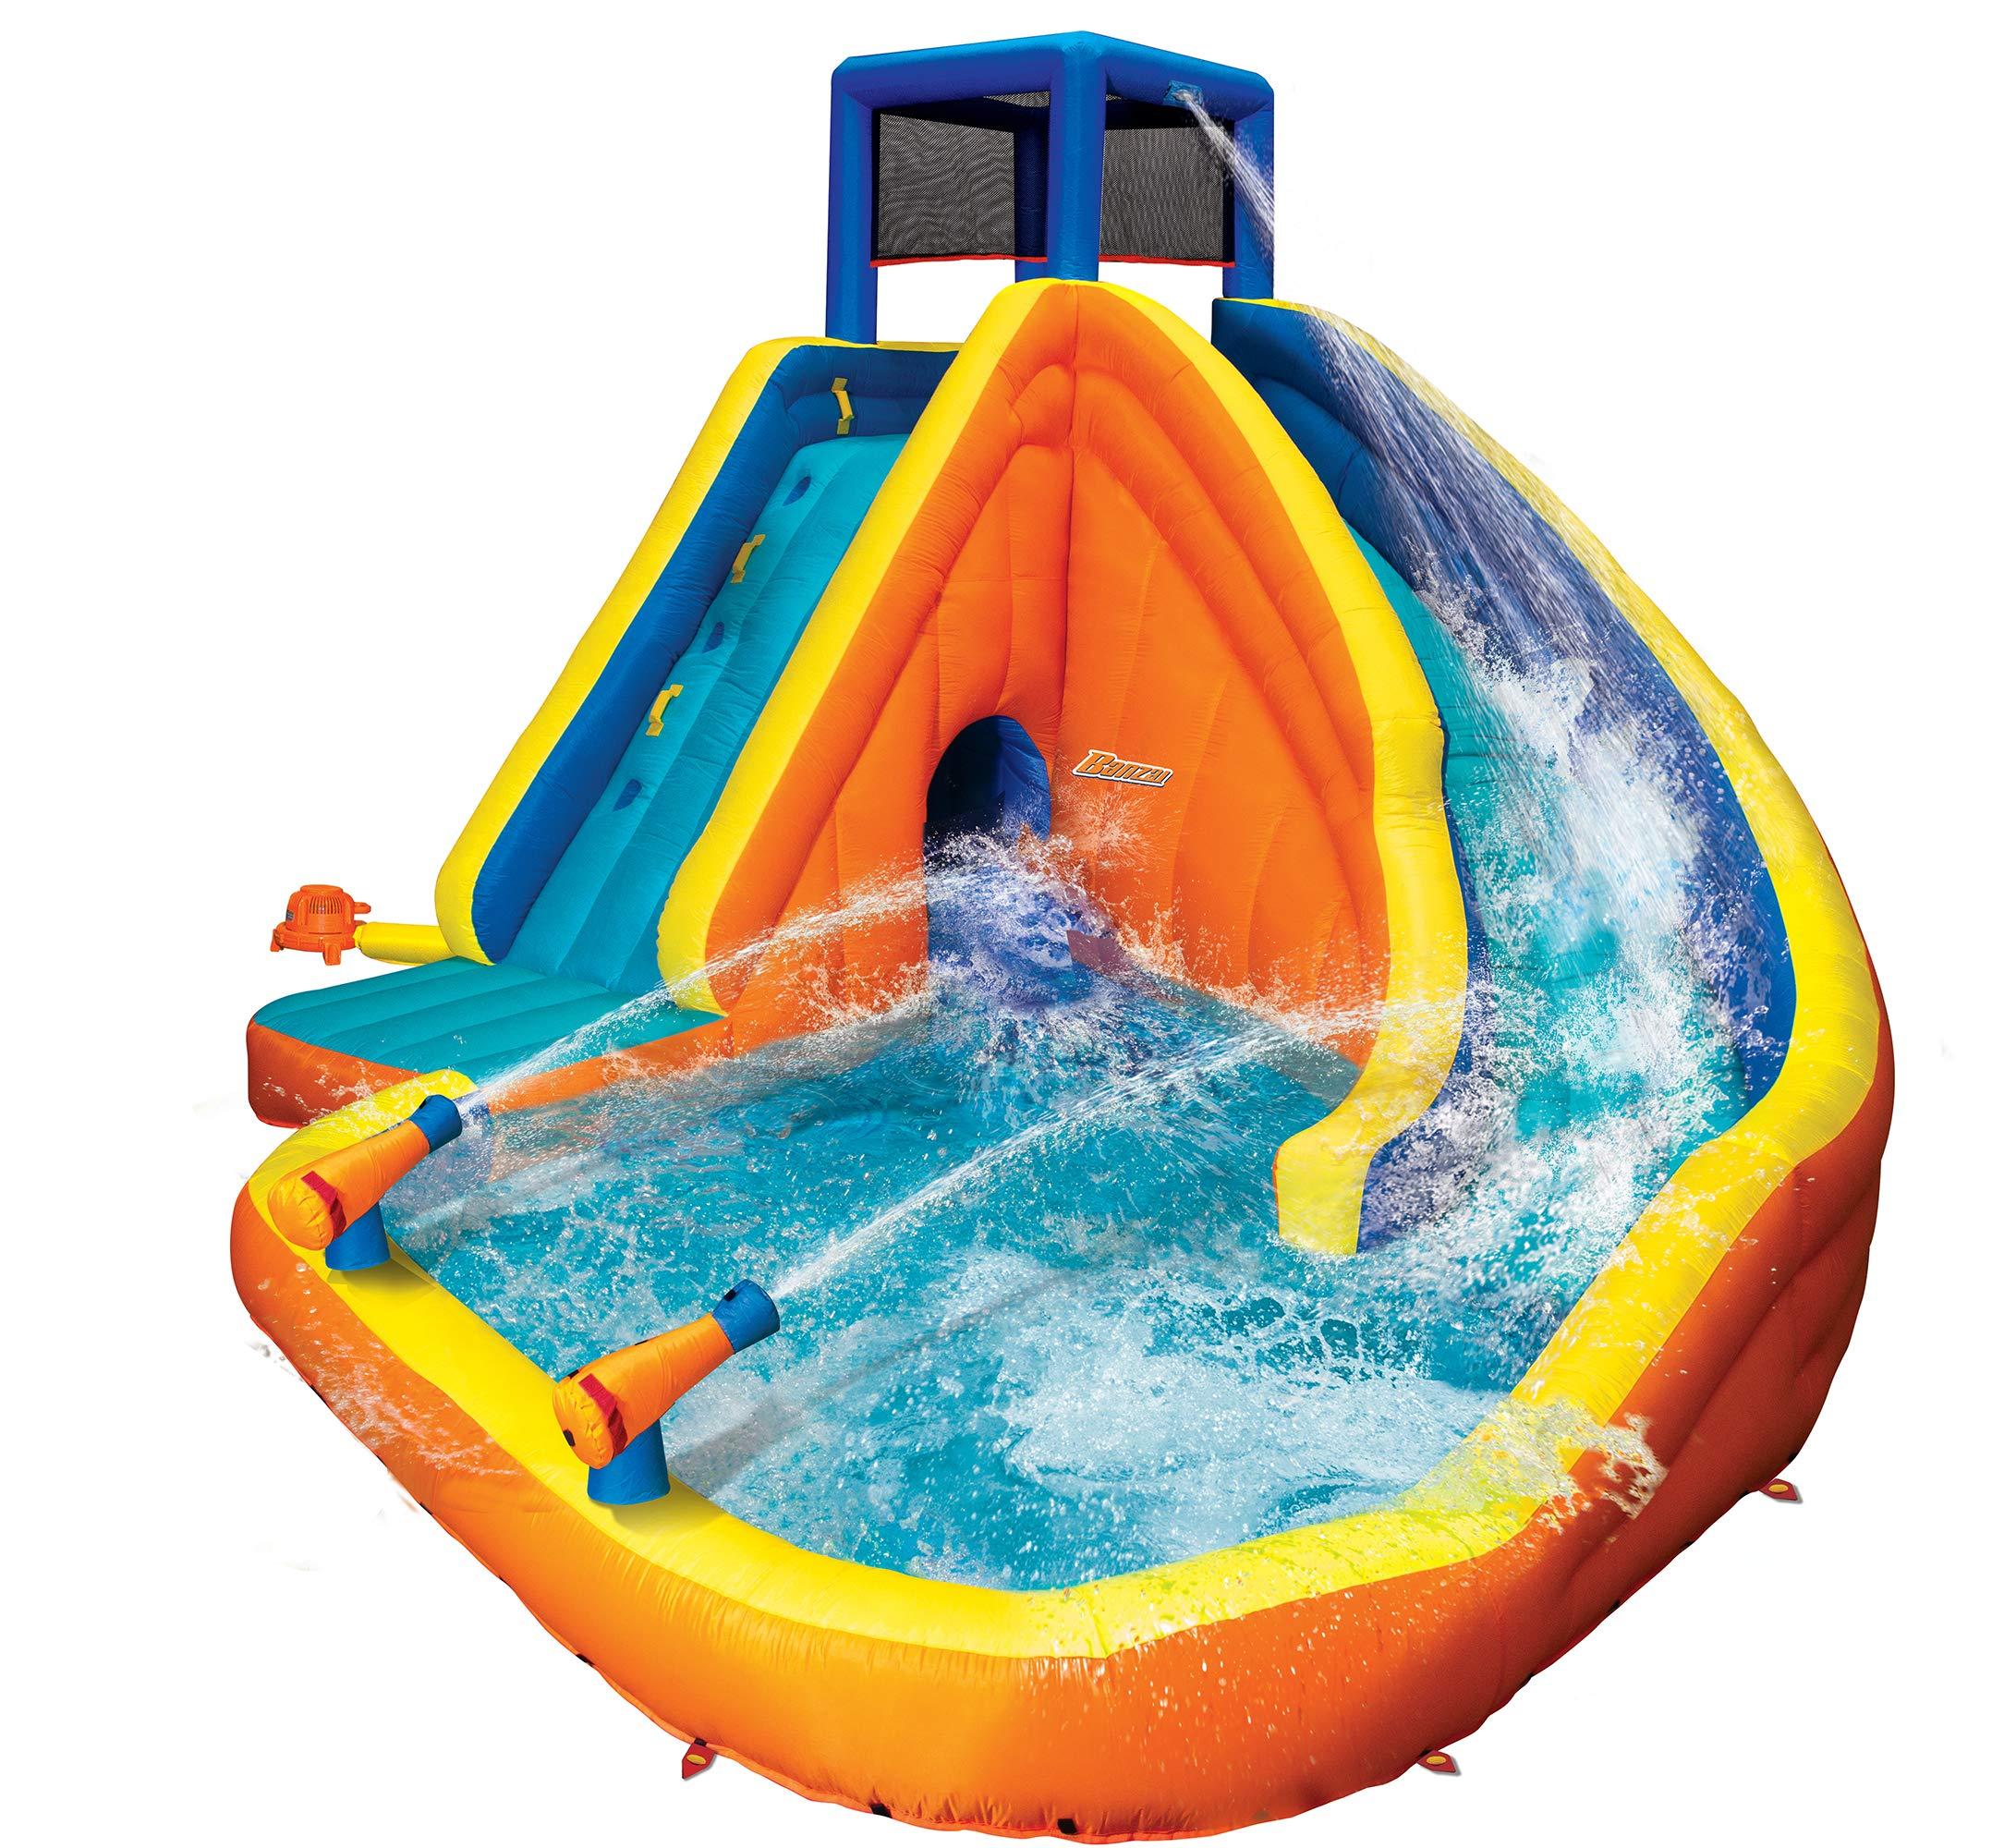 BANZAI 90494 Sidewinder Inflatable Tunnel